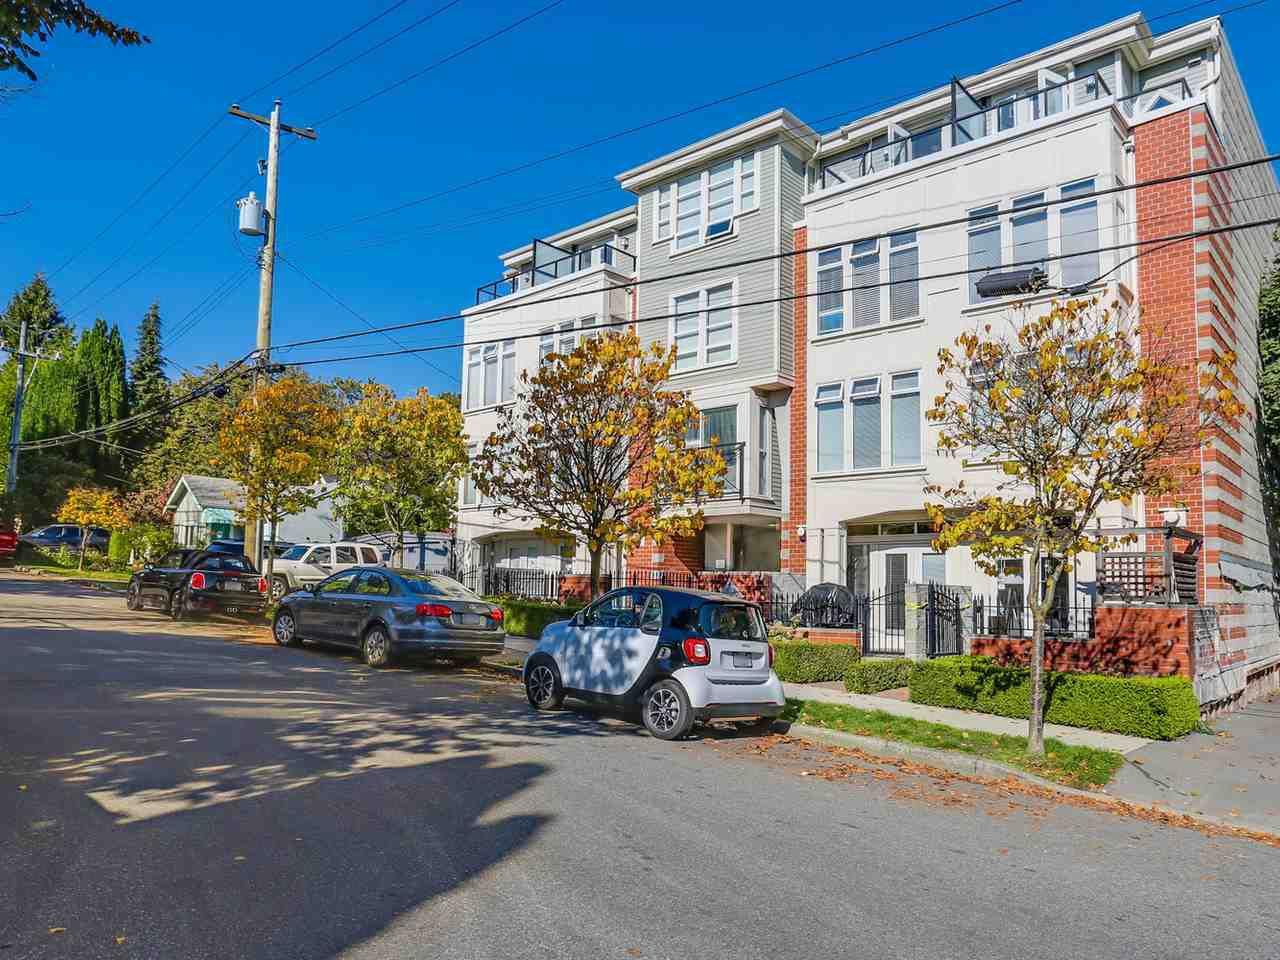 "Main Photo: 203 3637 W 17TH Avenue in Vancouver: Dunbar Condo for sale in ""Highbury Hosue"" (Vancouver West)  : MLS®# R2150087"